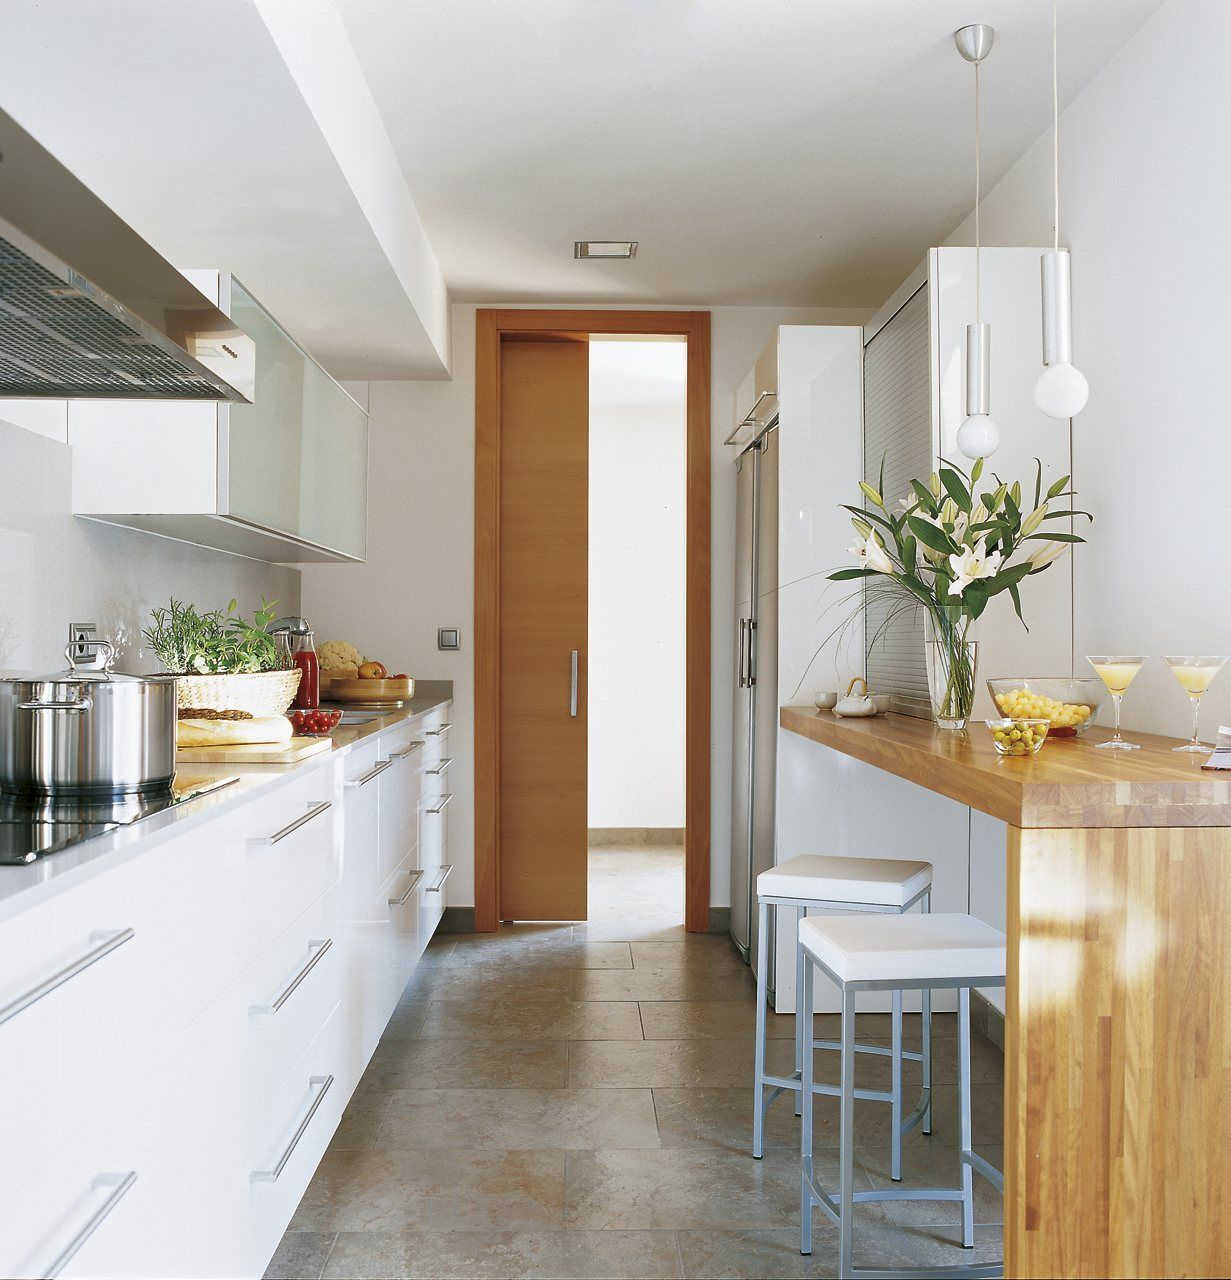 Ideas cocinas estrechas buscar con google deco cocinas for Muebles de cocina pequena